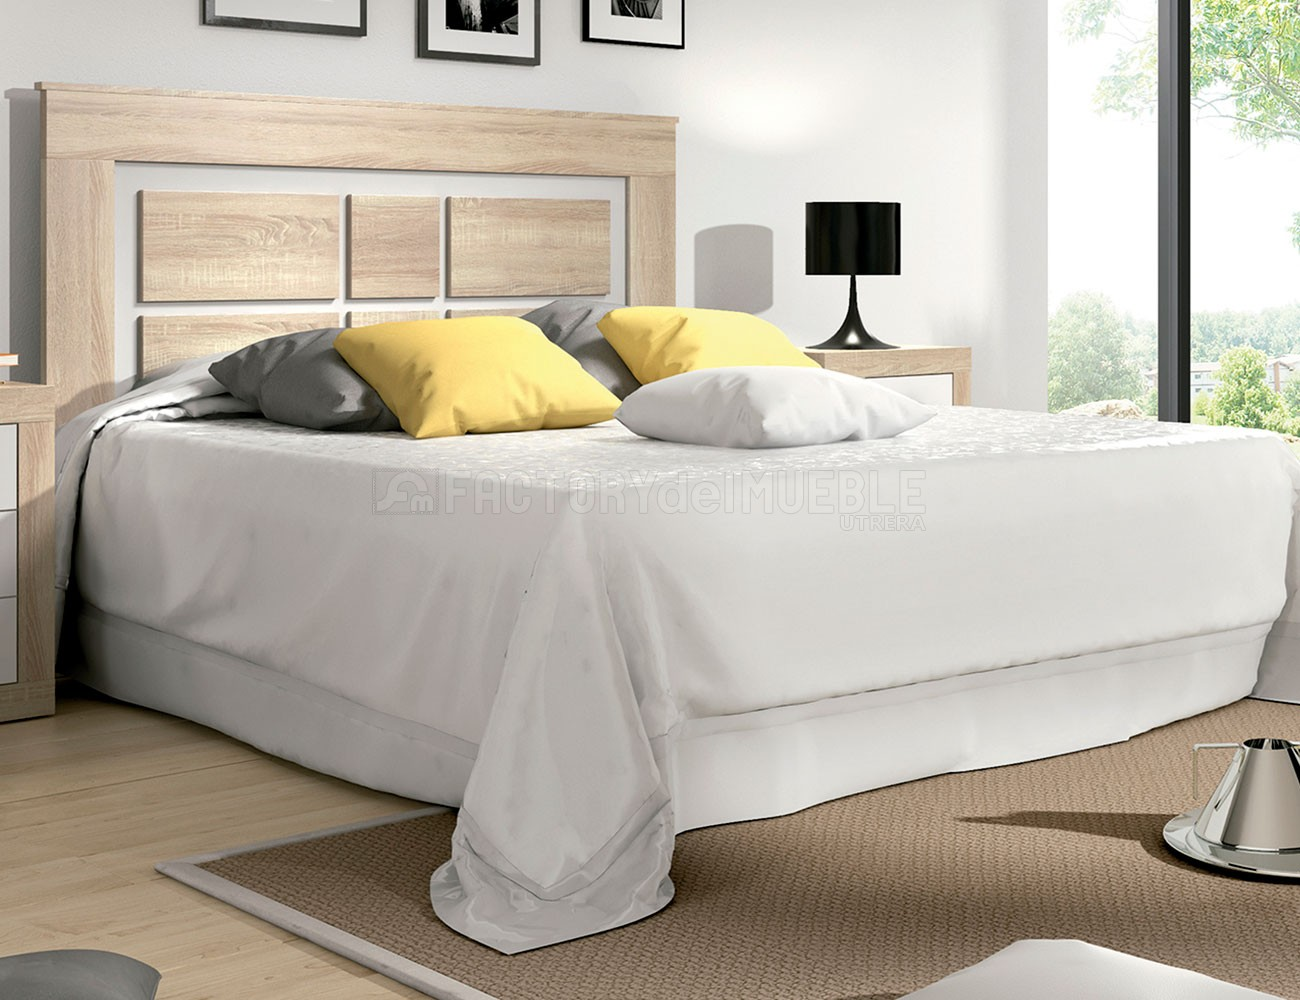 Cabecero dormitorio matrimonio moderno cambrian blanco